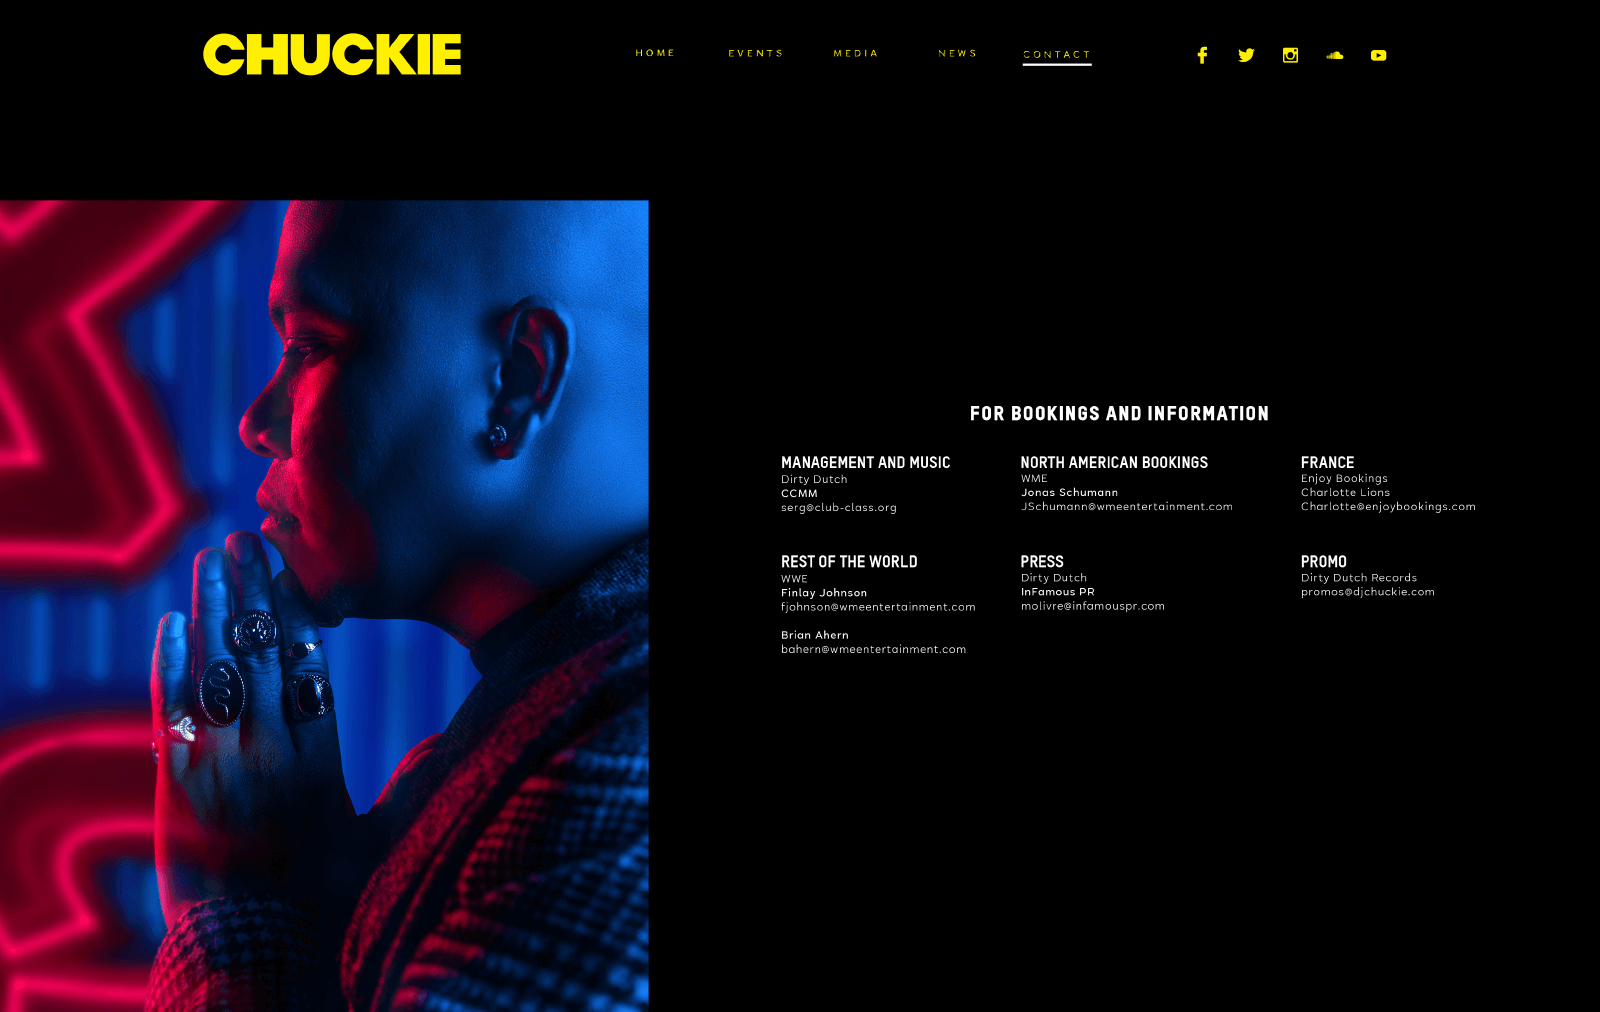 chuckie-mariogonsalves-4